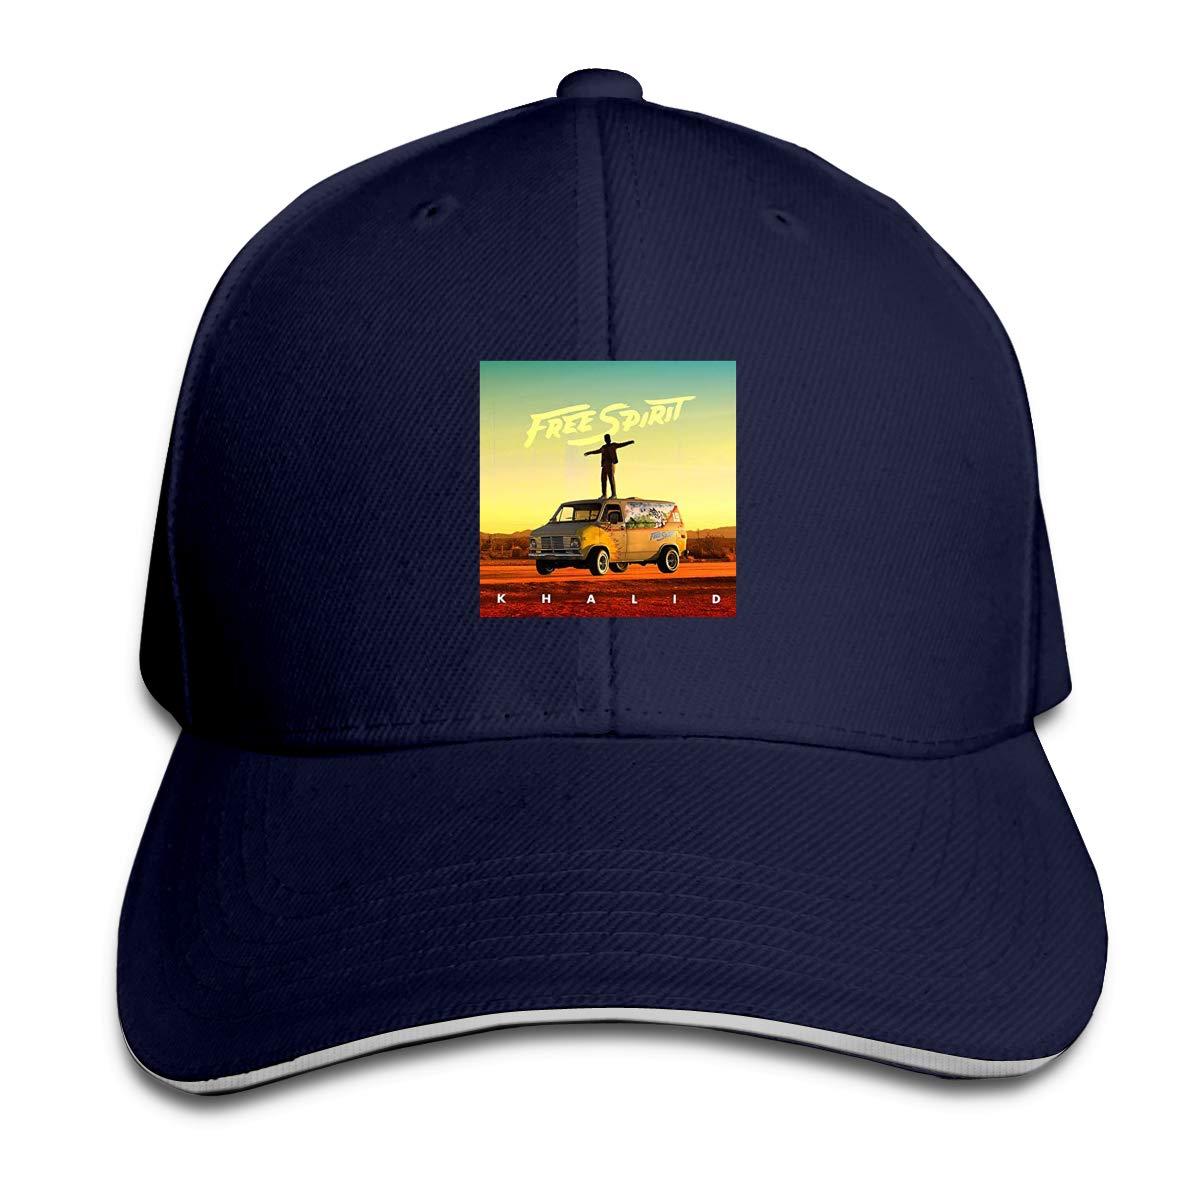 Khalid Adjustable Sports Hats Sun Hat for Men and Women